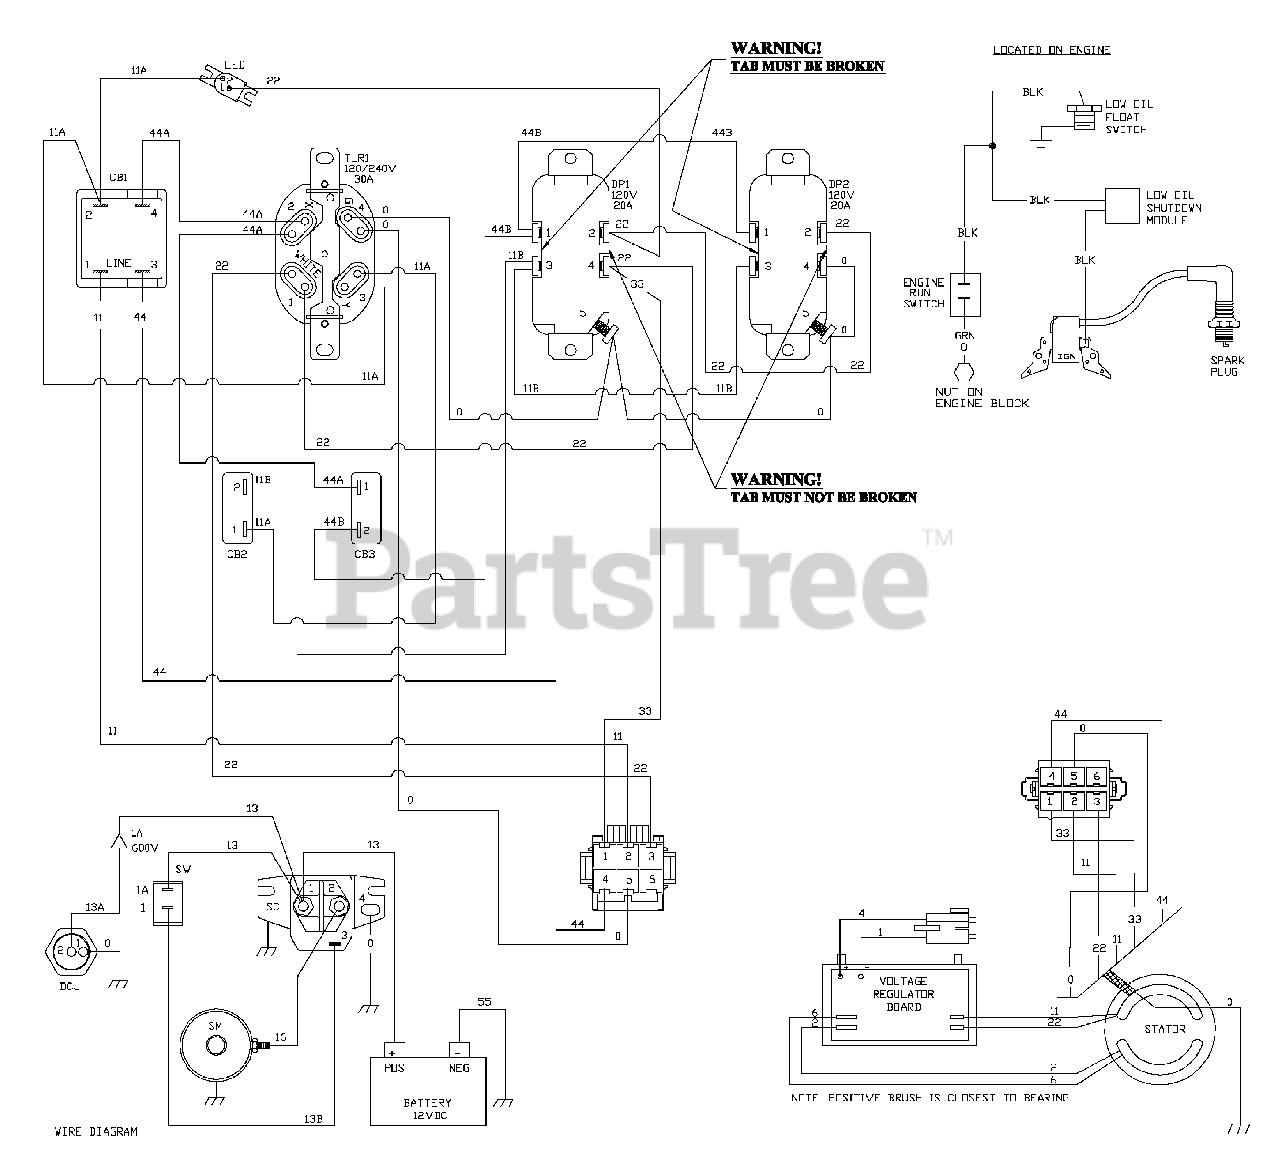 [DIAGRAM] Troy Bilt Generator Wiring Diagram FULL Version